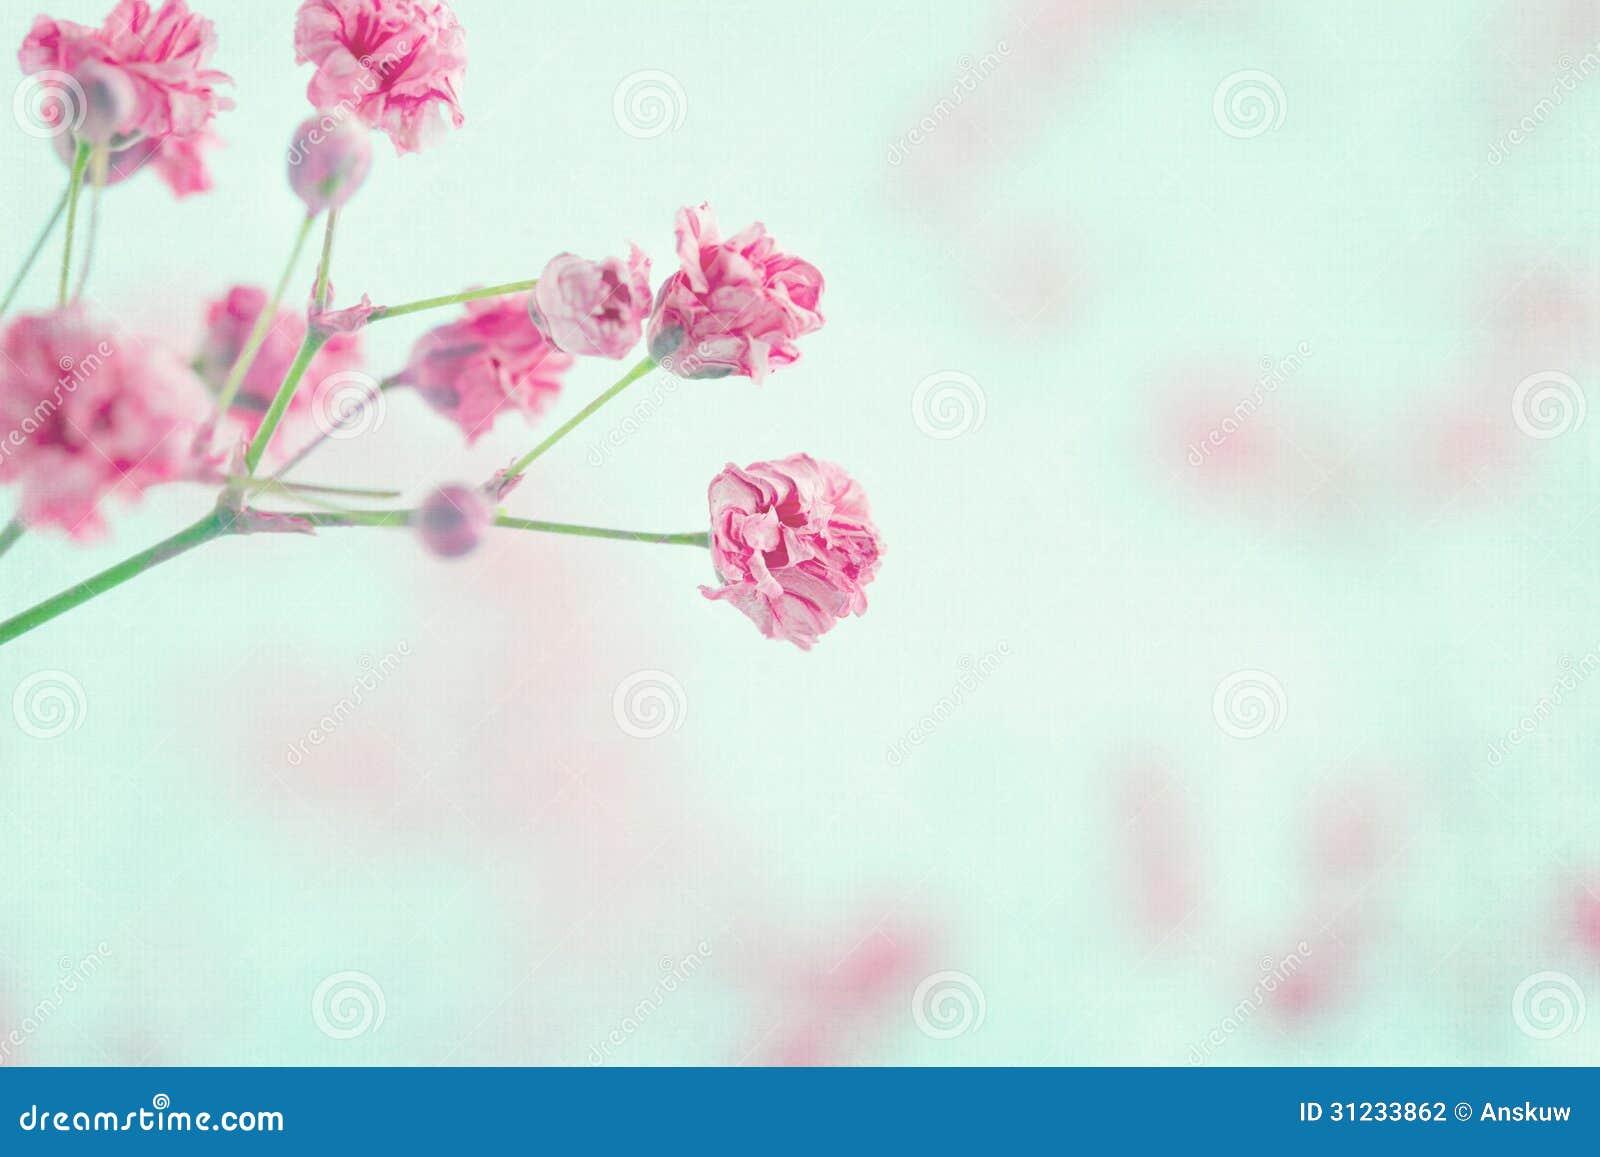 Pink Babys Breath Flowers Closeup Stock Photo 31233862 Megapixl